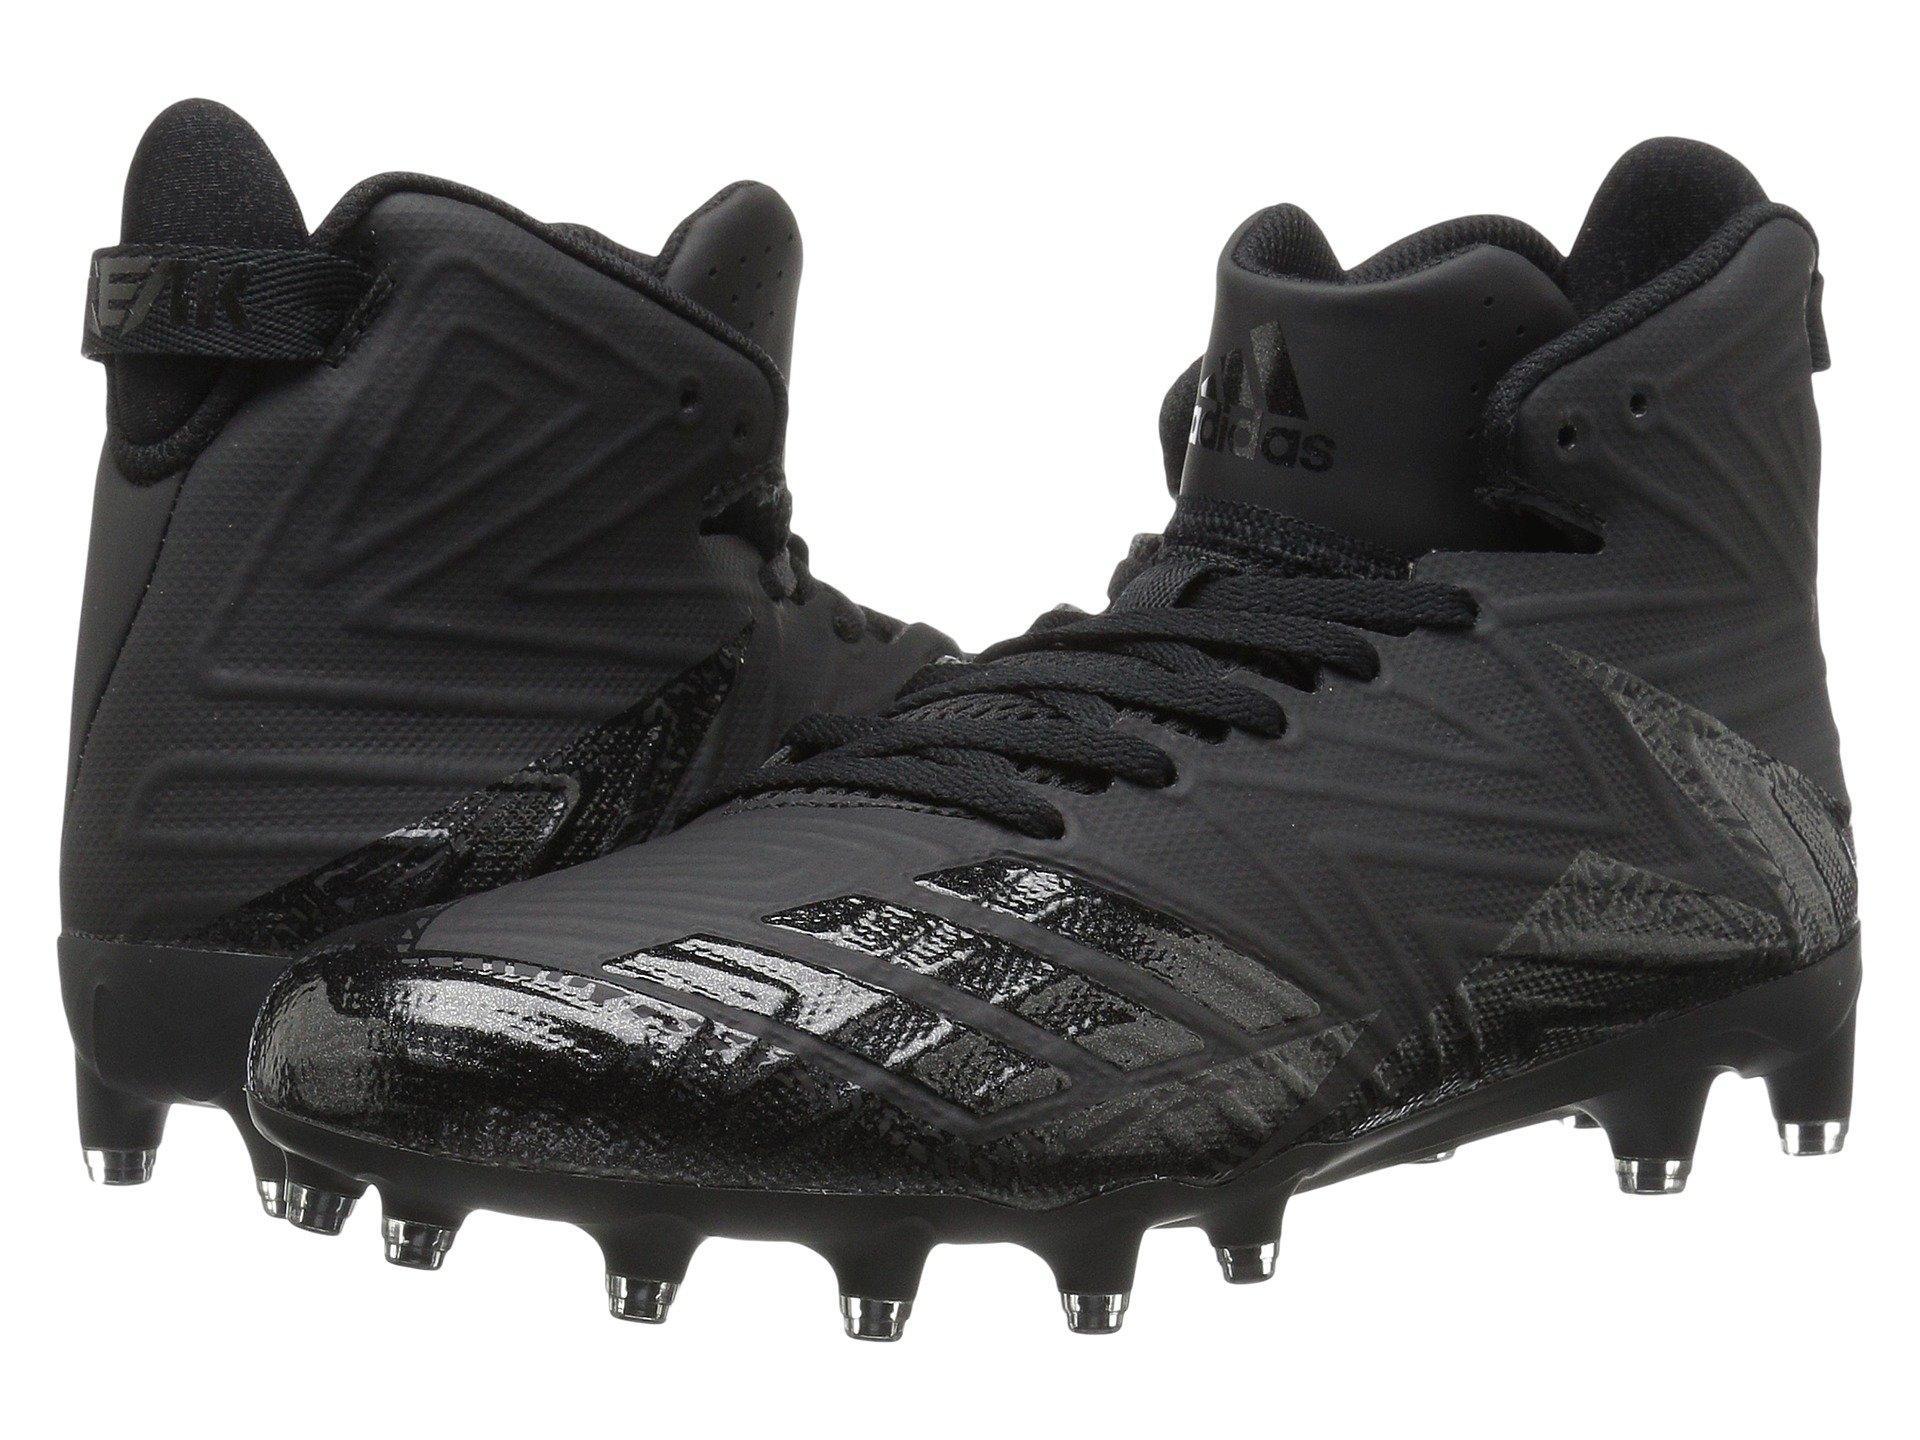 0d1f89010 Adidas Originals Freak X Carbon Mid Football In Black